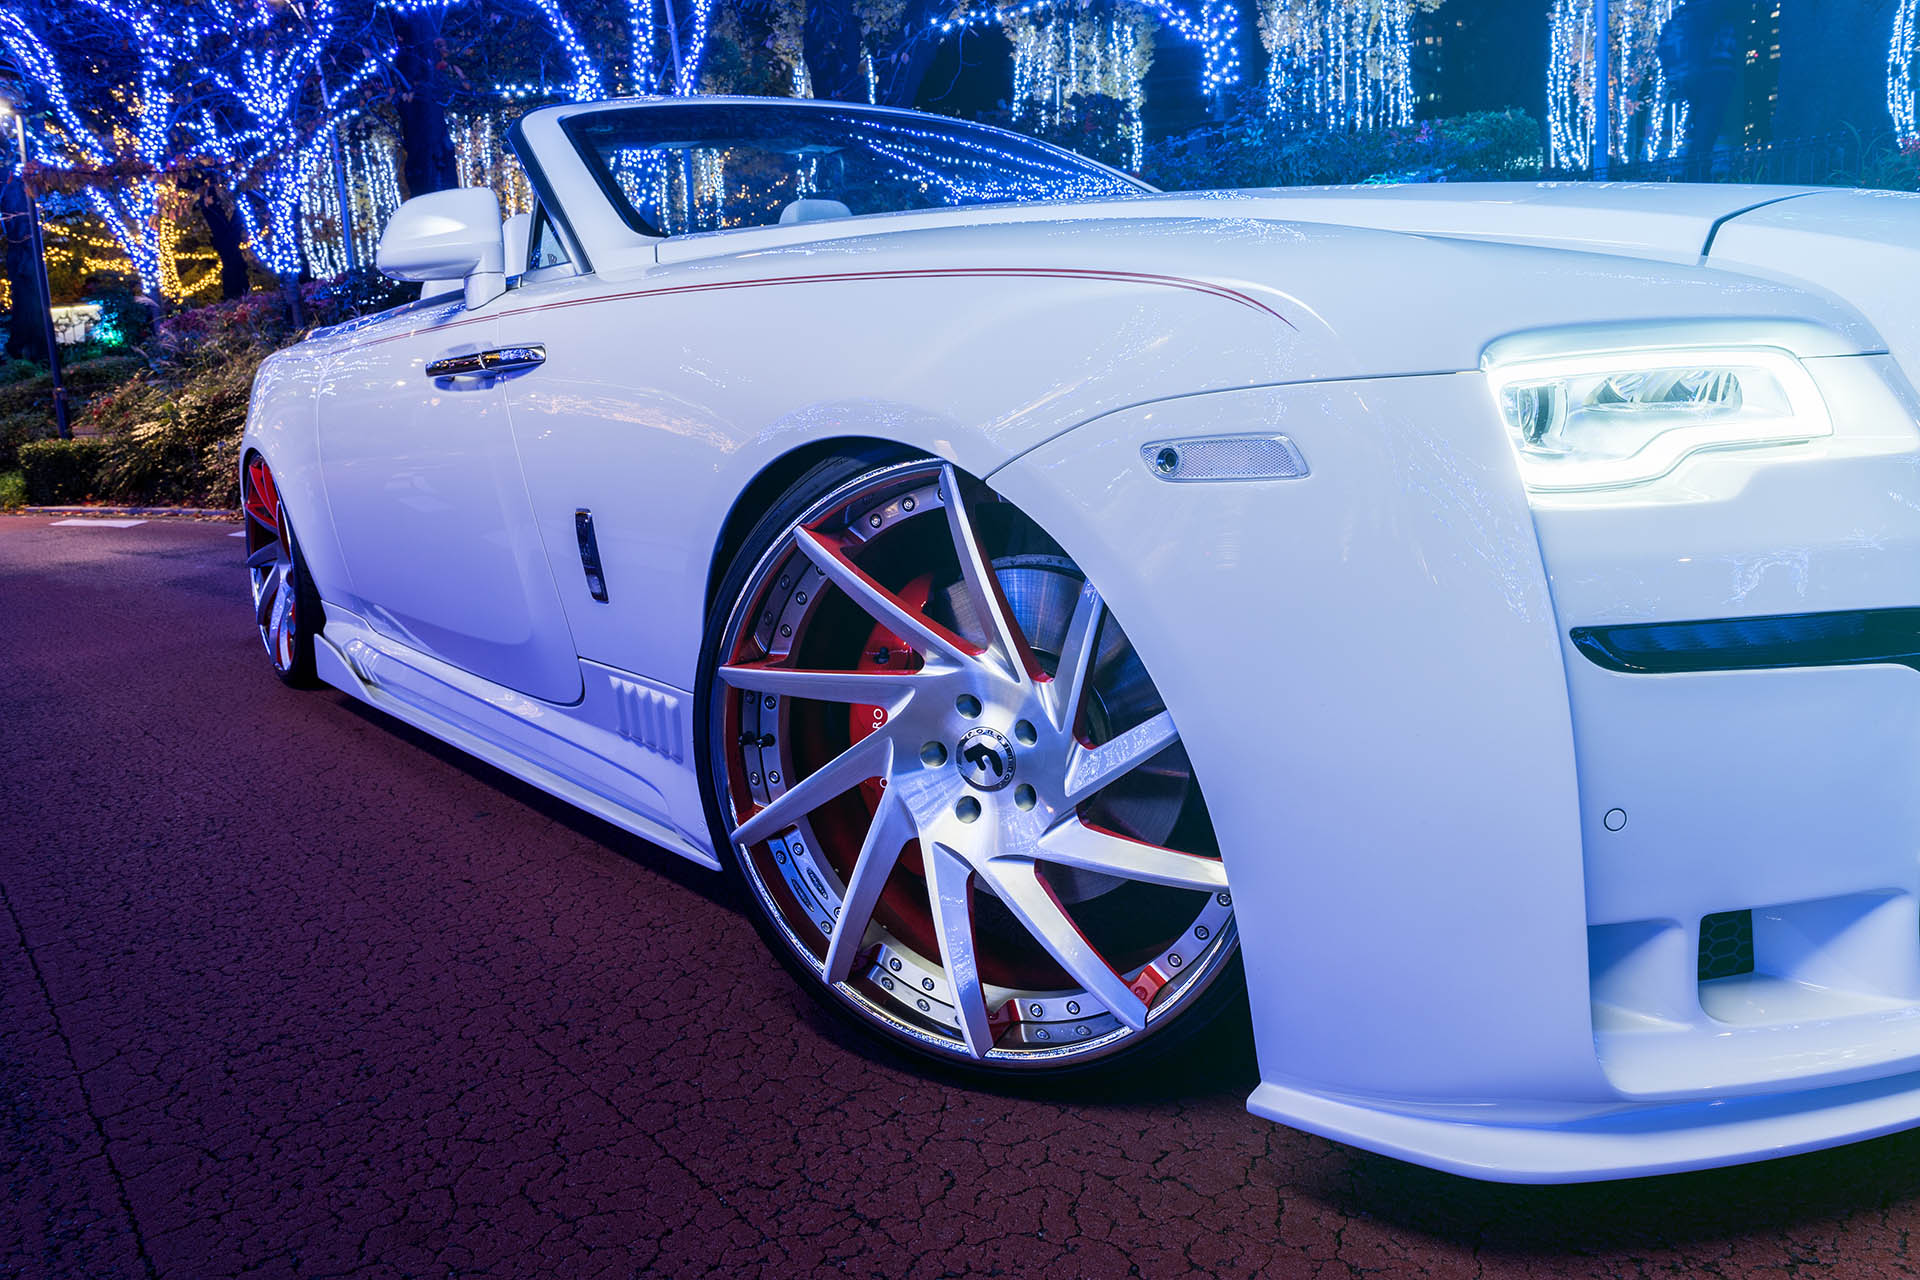 Slammed Rolls Royce Dawn Makes Quite The Statement